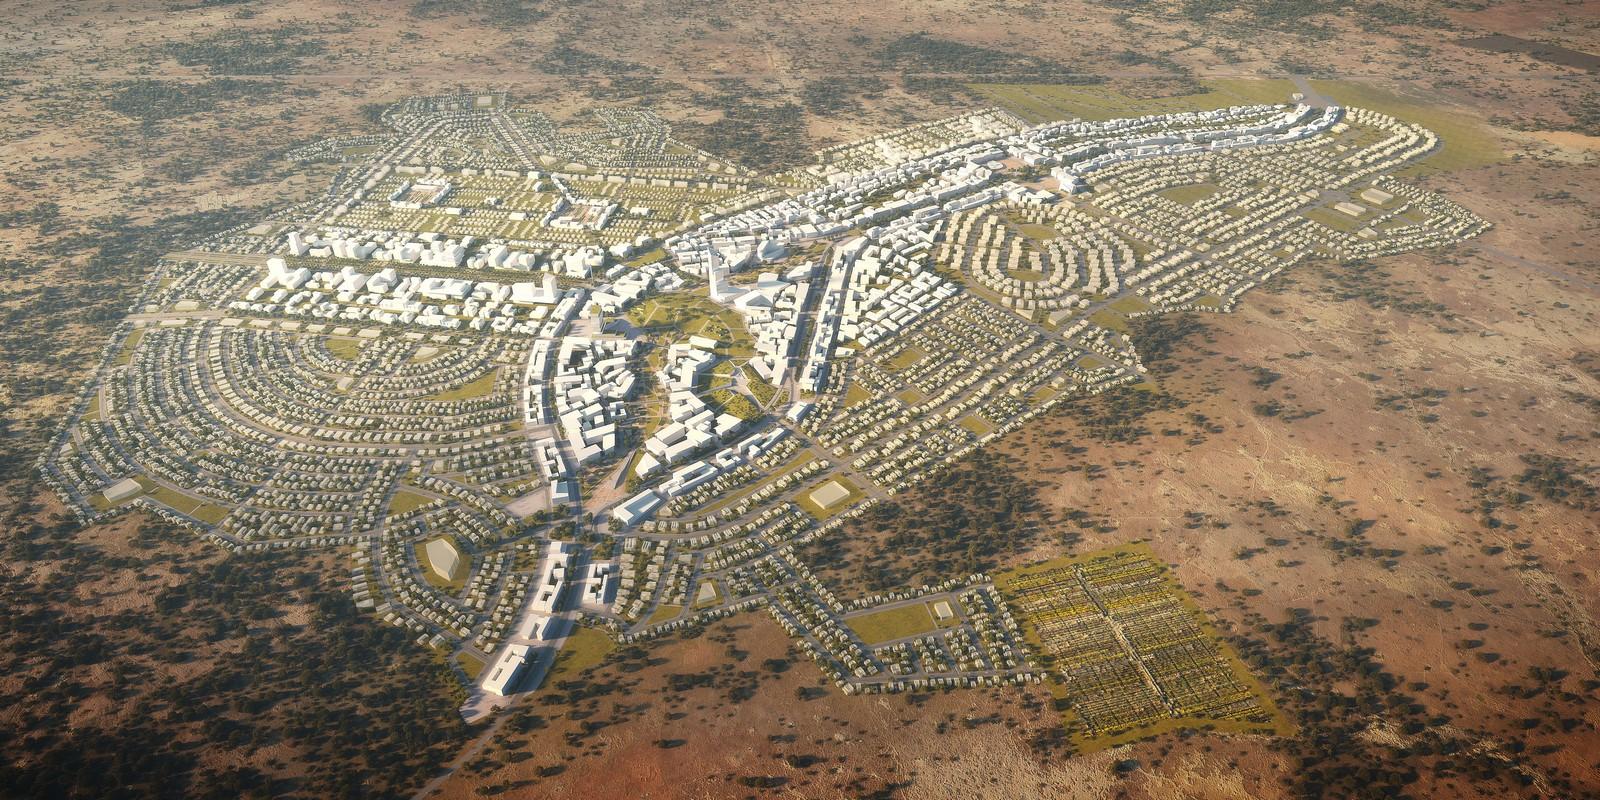 New Town of Yennenga - Sheet1